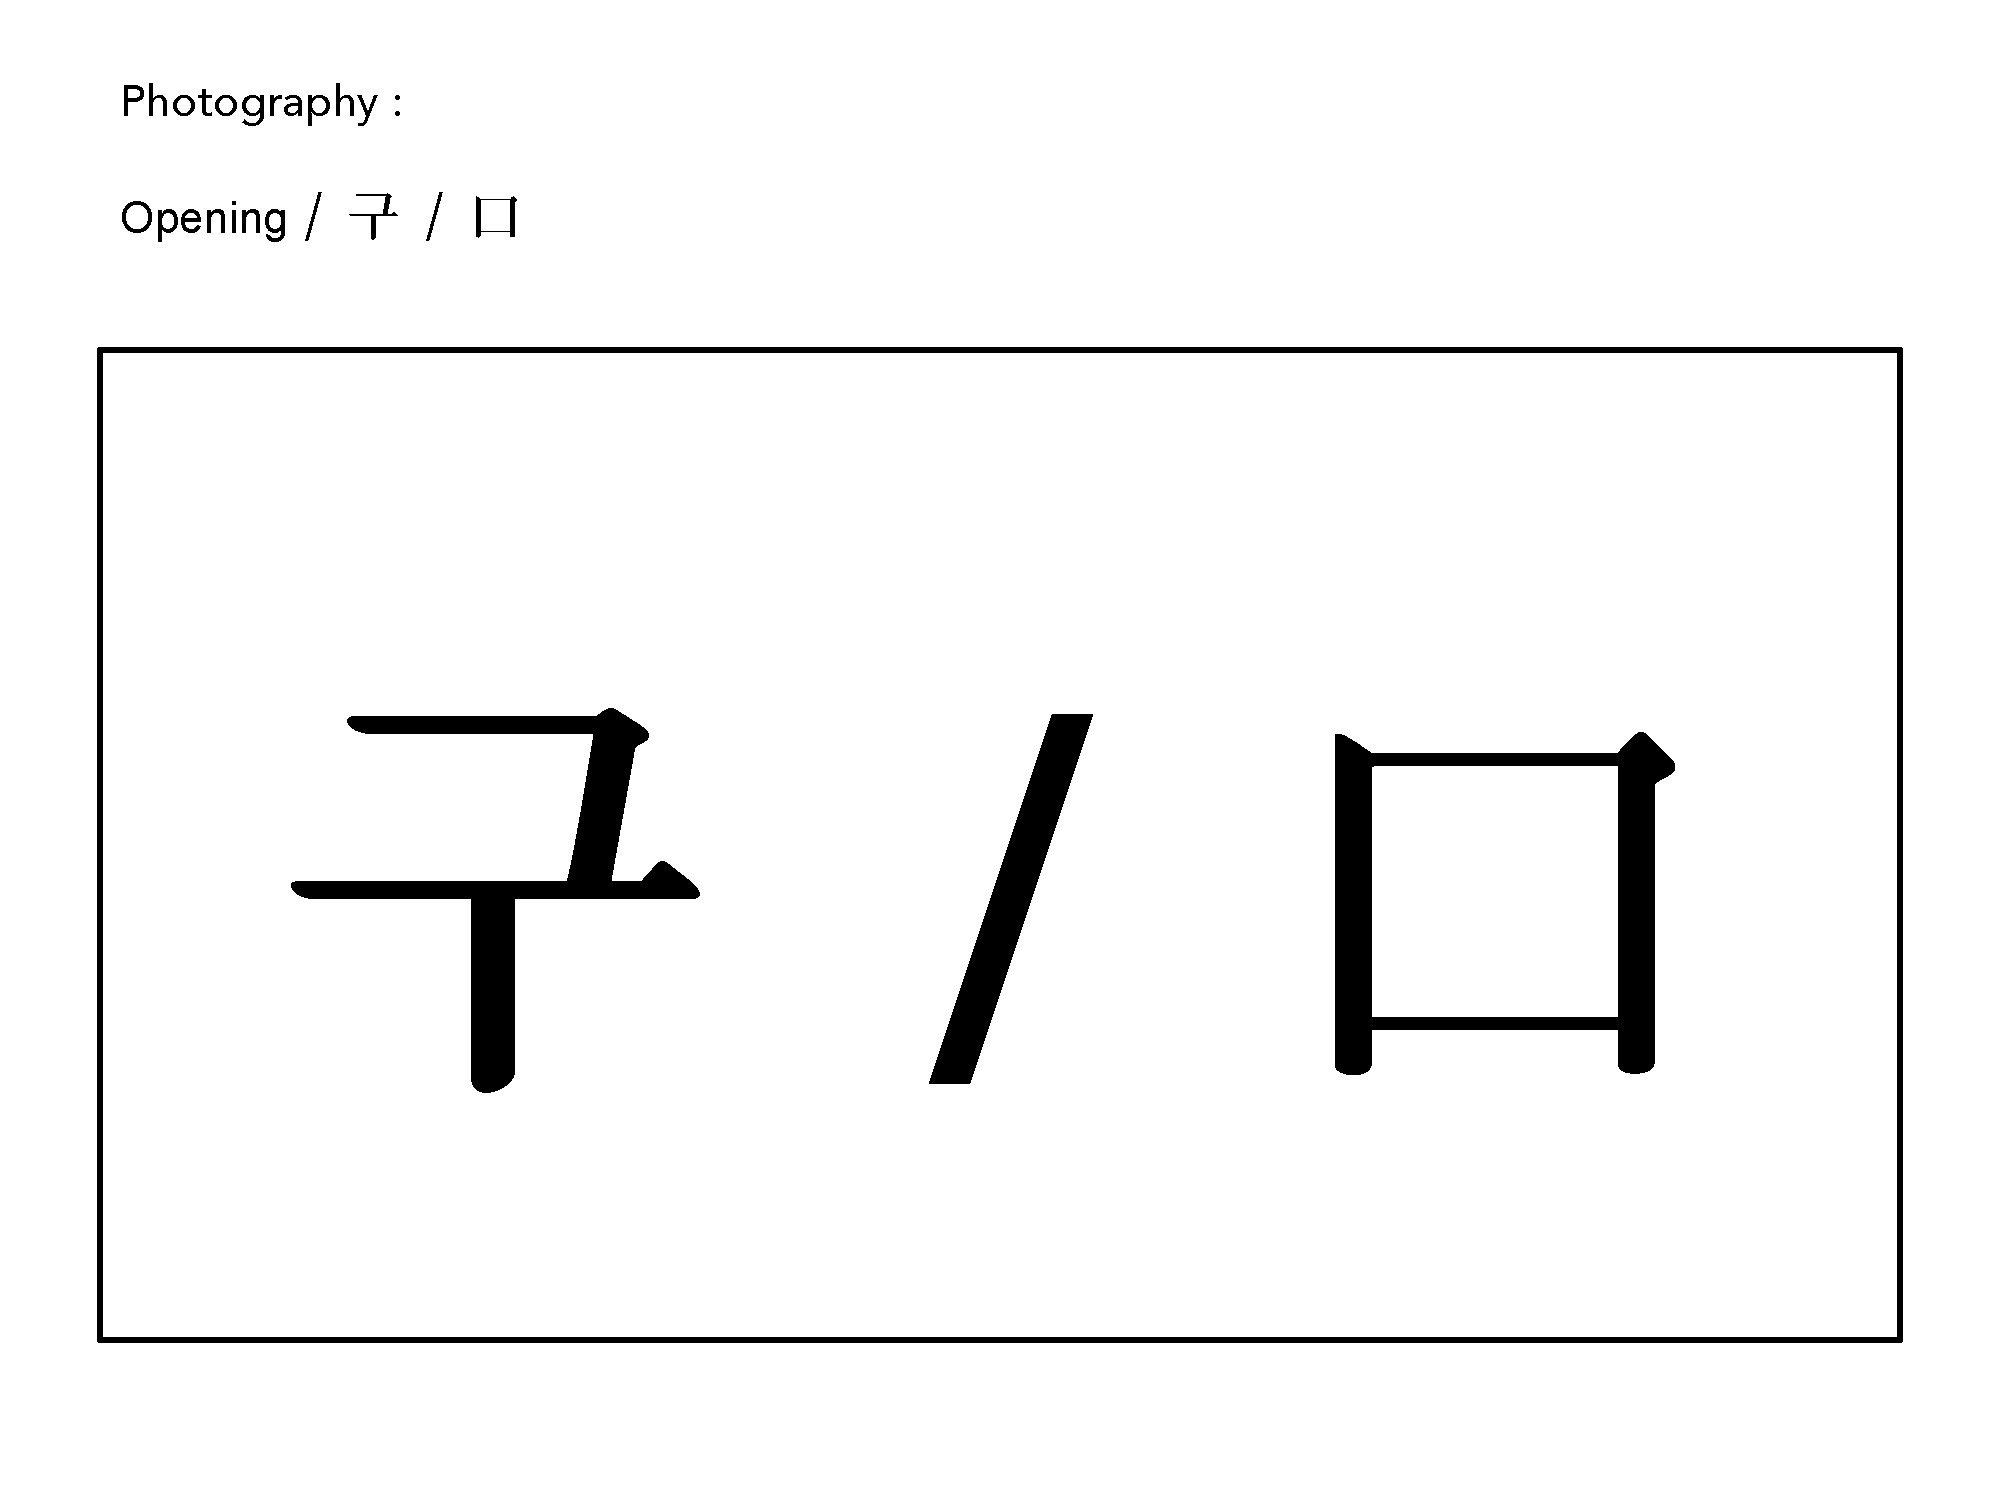 test_Page_04.jpg